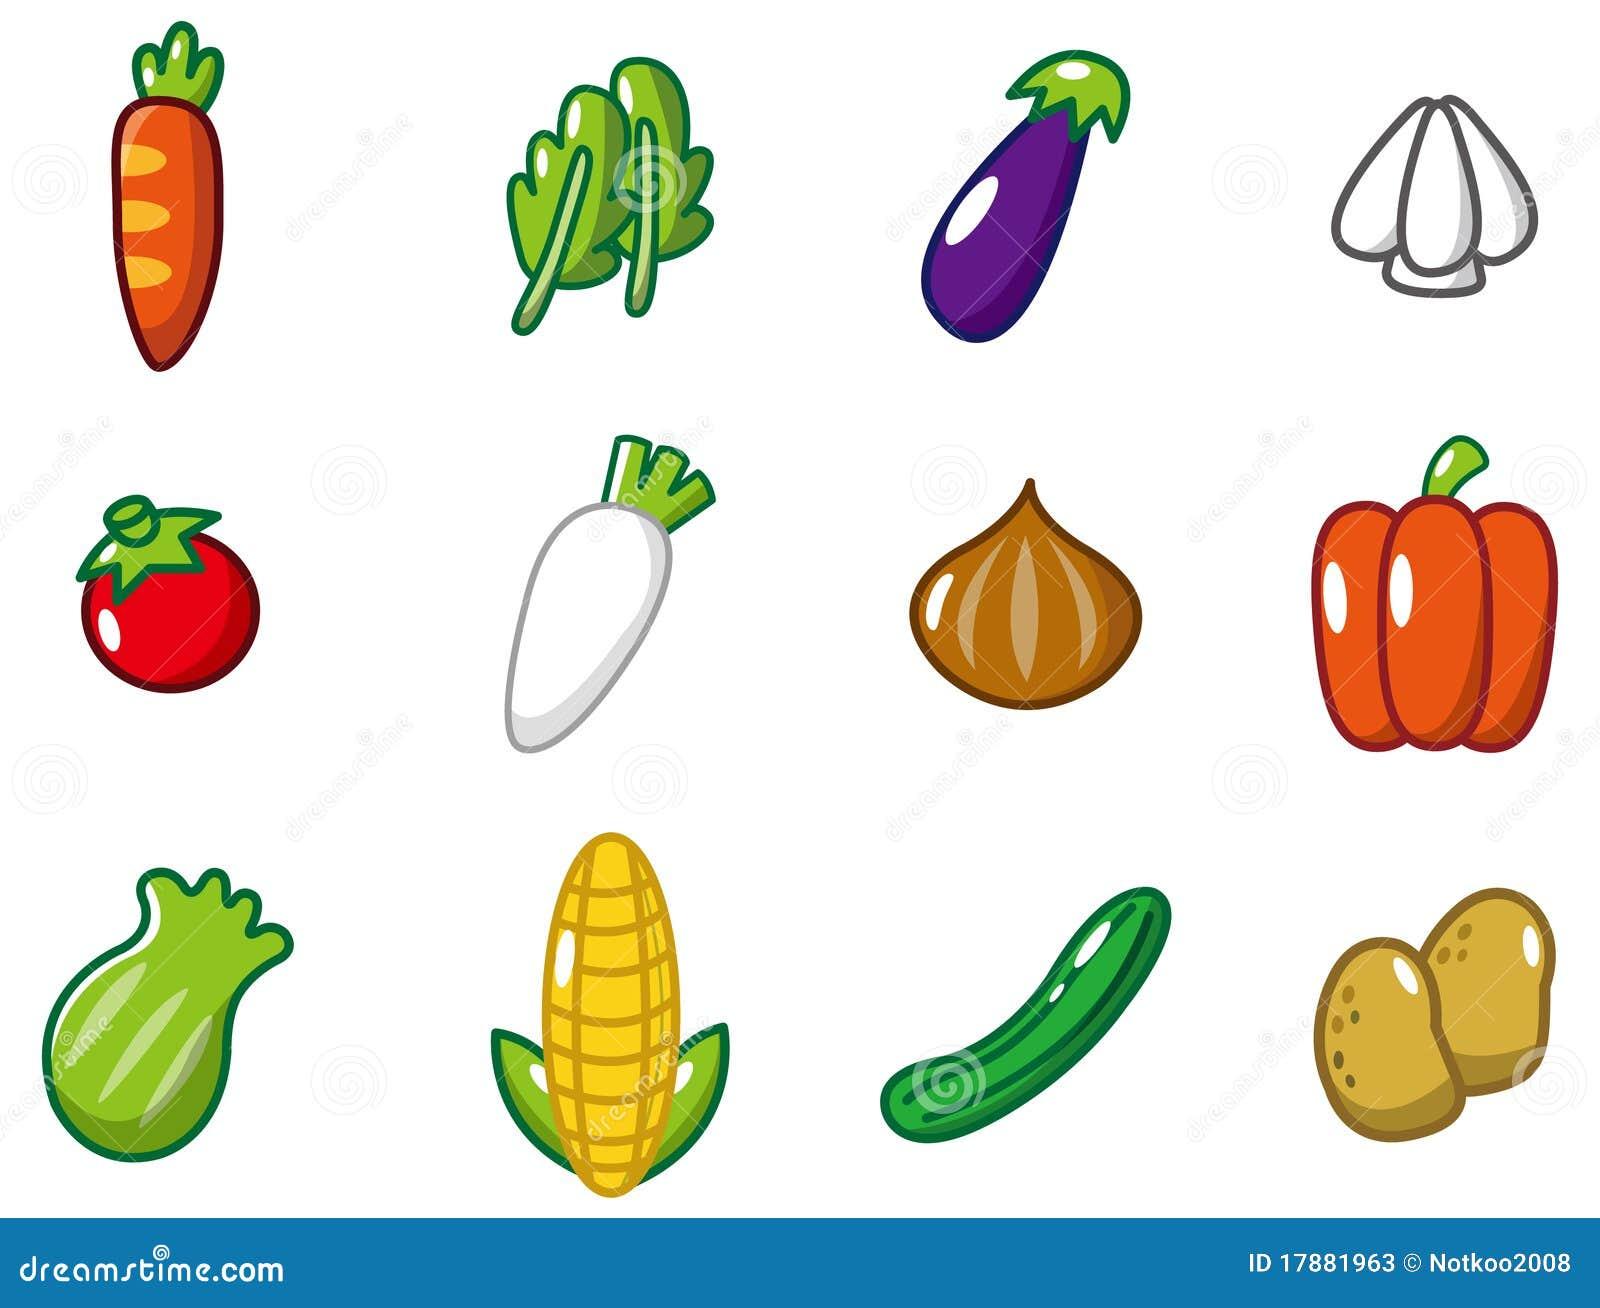 Cartoon Vegetables Icon Stock Photos Image 17881963